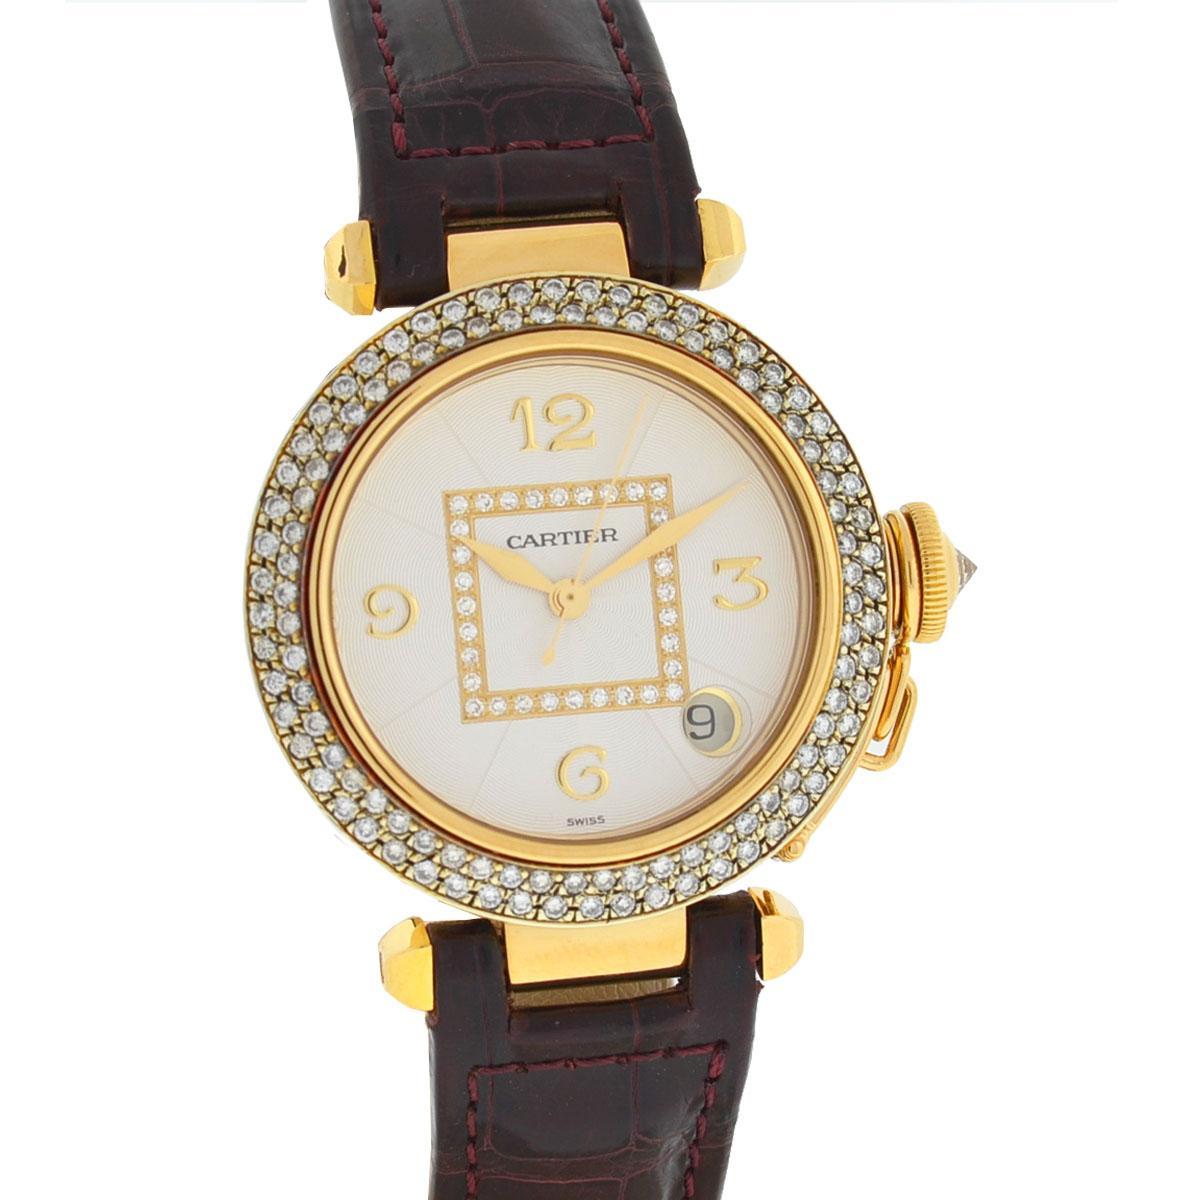 Cartier Pasha 18 Karat Yellow Gold Factory Dial Diamond Bezel Watch